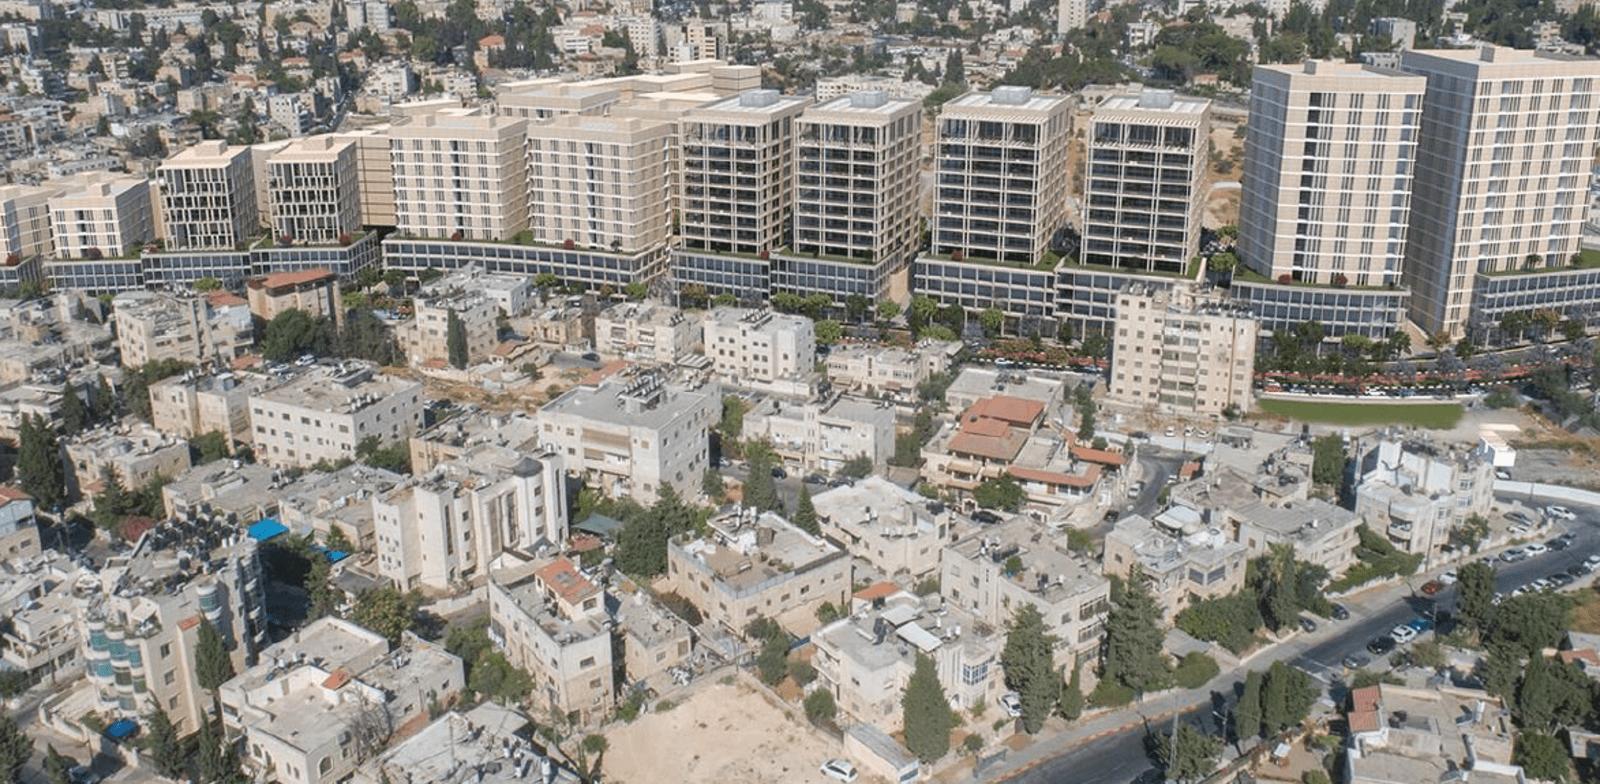 Impression of new business zone in Wadi al-Joz  credit: Ari Cohen Architecture and Urban Planning